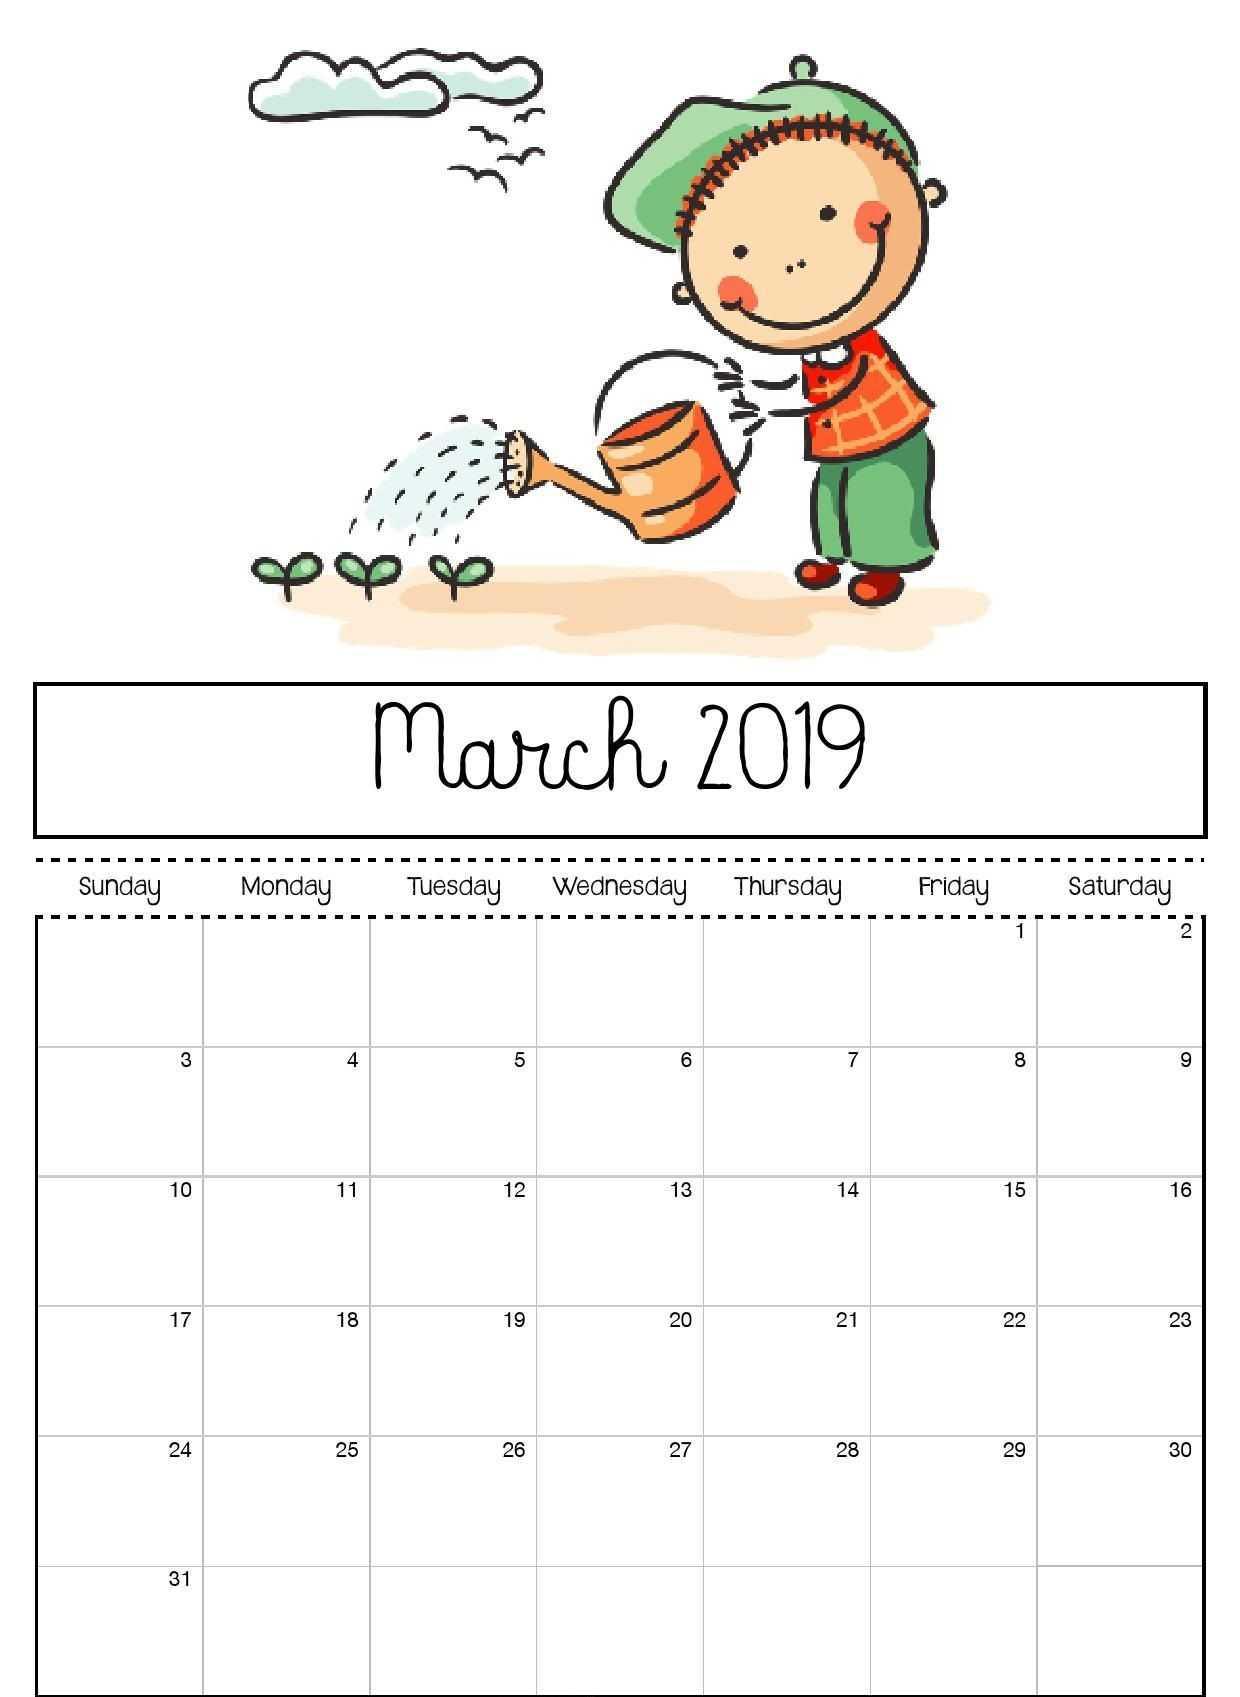 March 2019 Printable Calendar For Kids | Kids Calendar In Blank Calendar Template For Kids